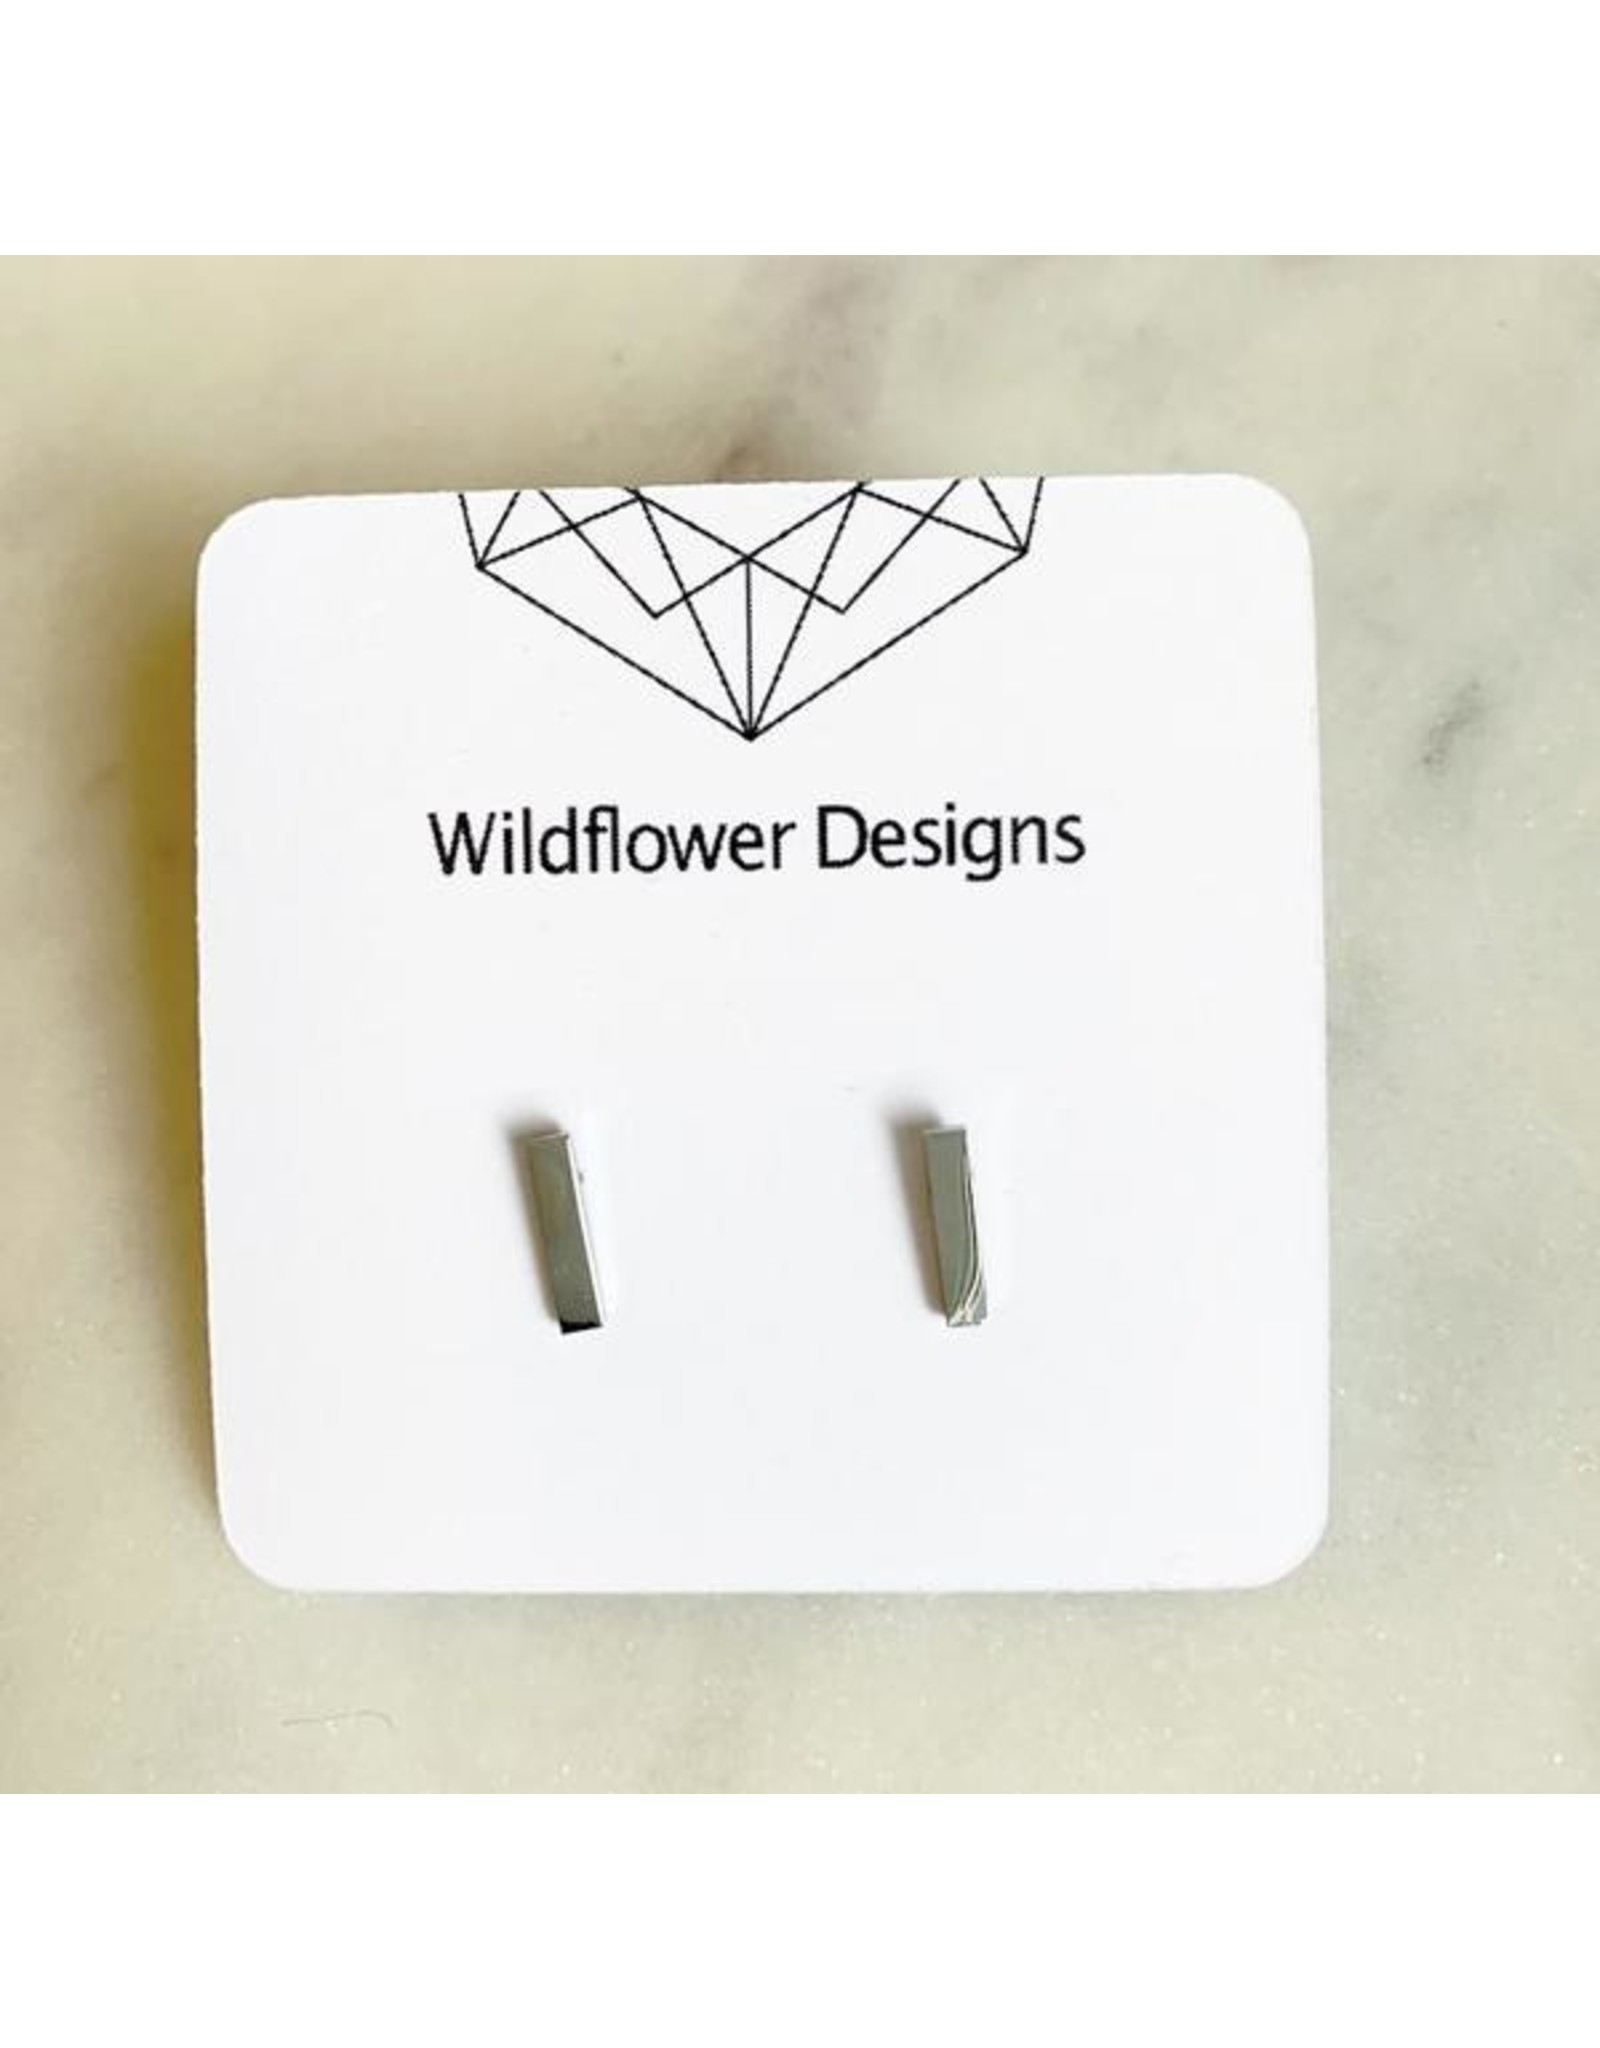 wildflower designs - Bar - Stainless Steel Studs